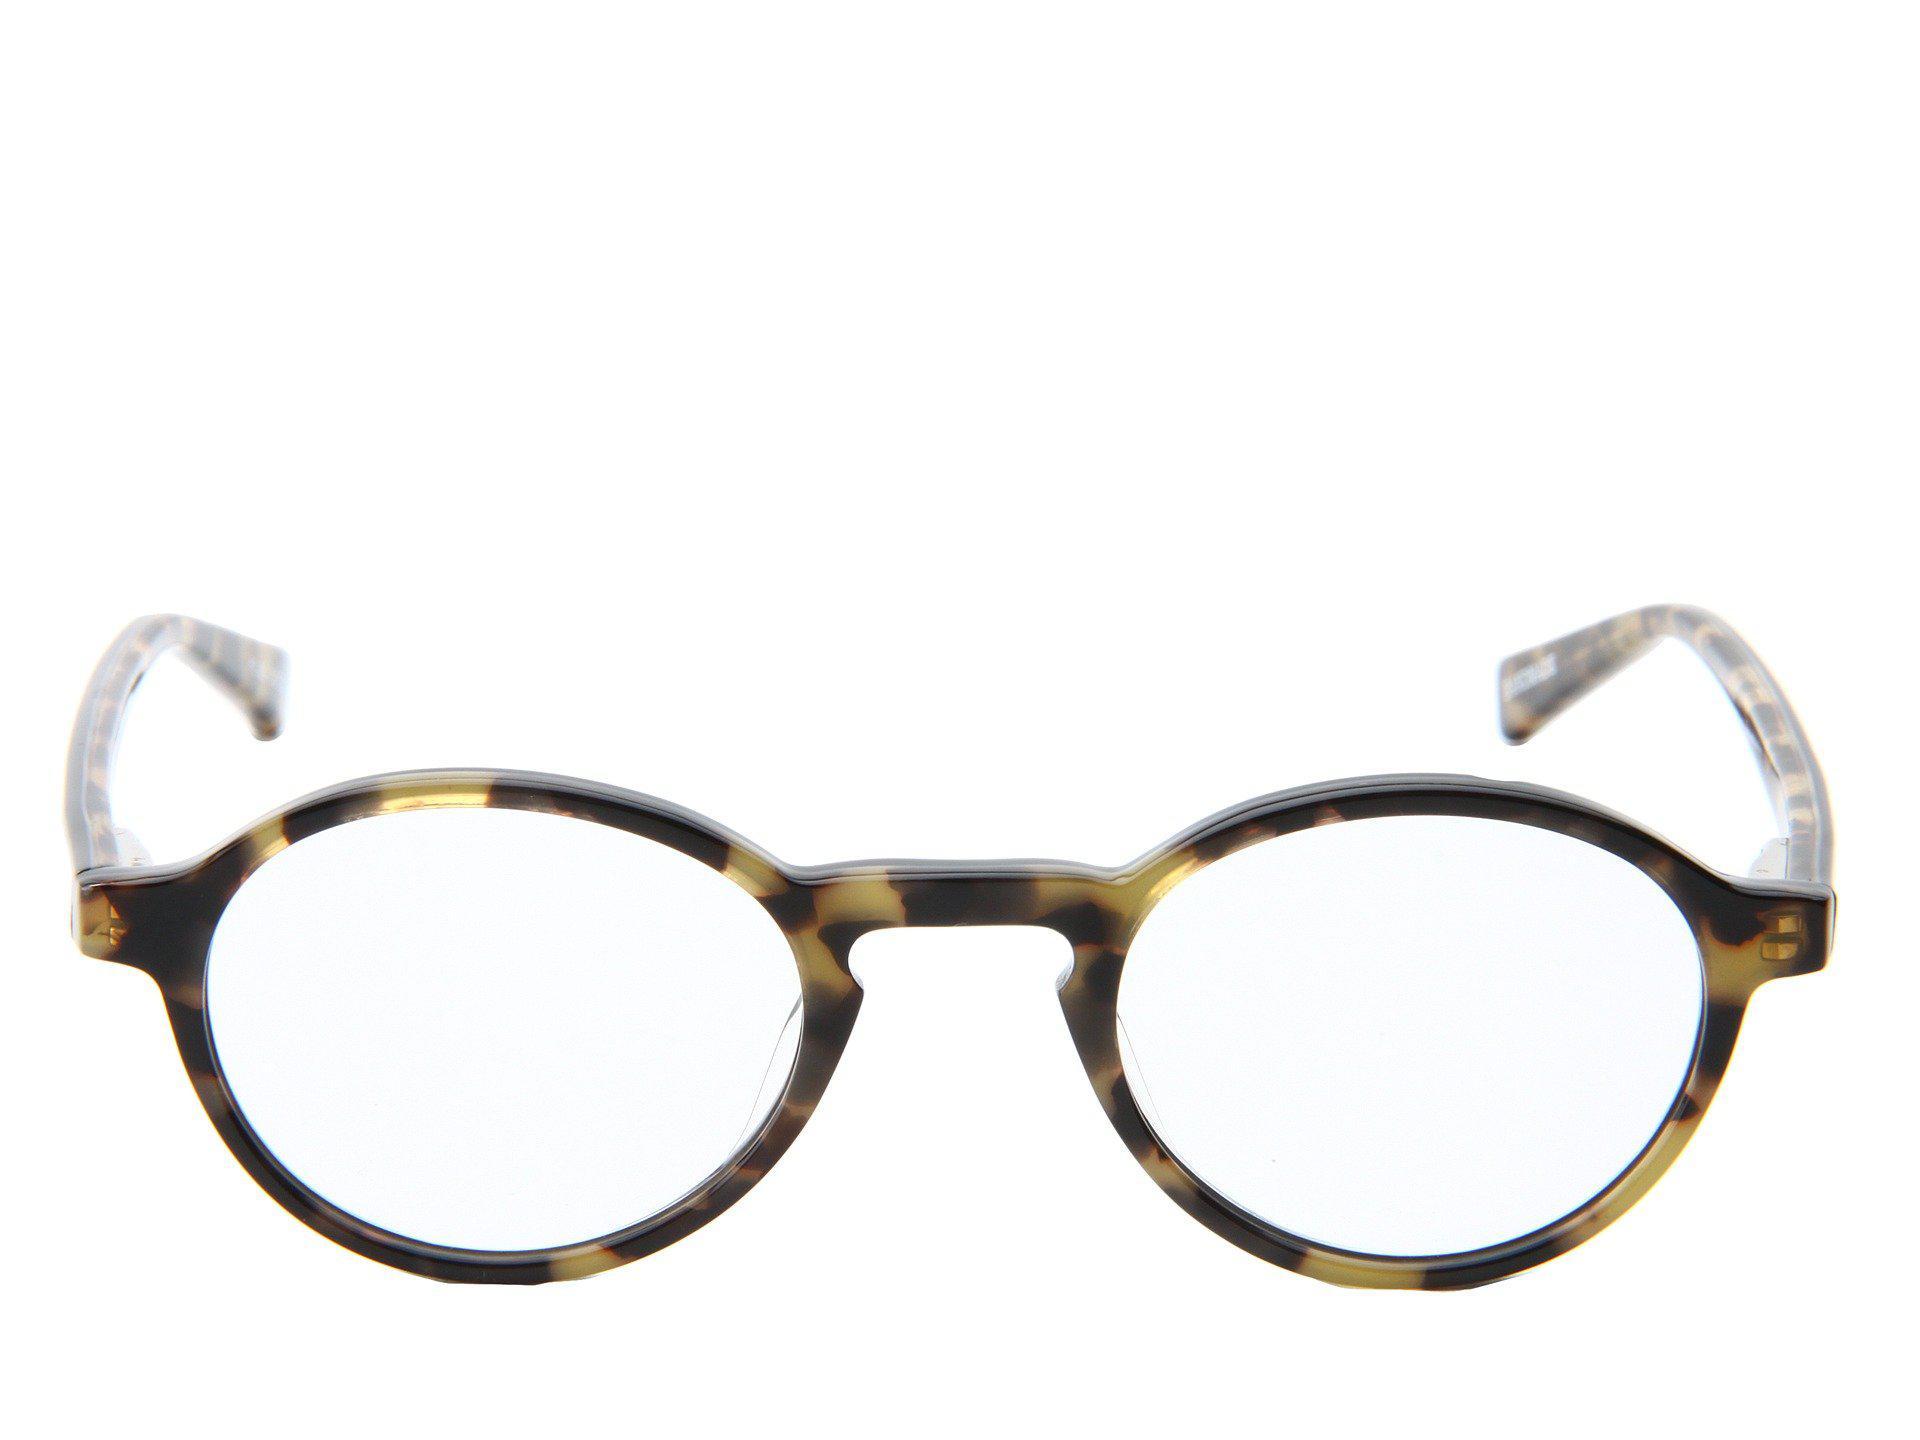 b8b317c335 Lyst - Eyebobs Board Stiff (tortoise 1) Reading Glasses Sunglasses ...